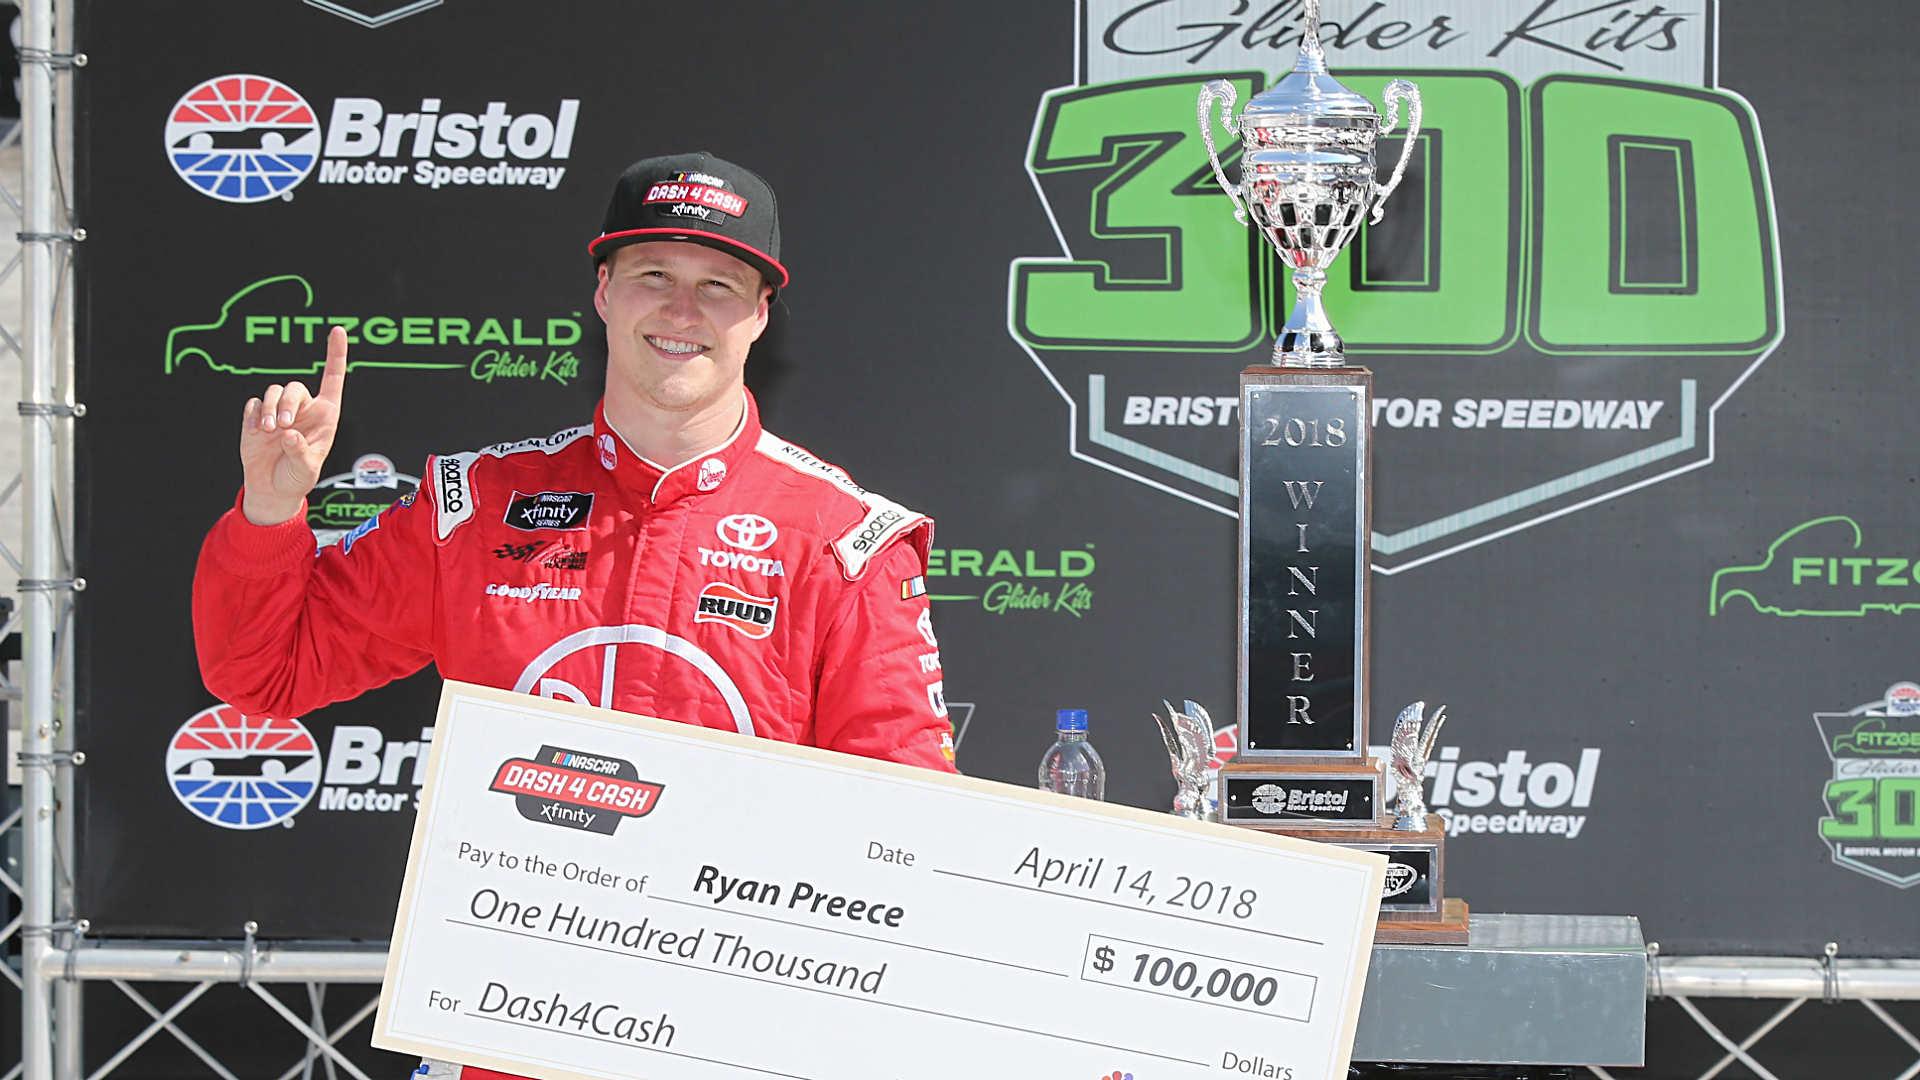 NASCAR at Bristol: Ryan Preece wins Xfinity race, $100,000 bonus